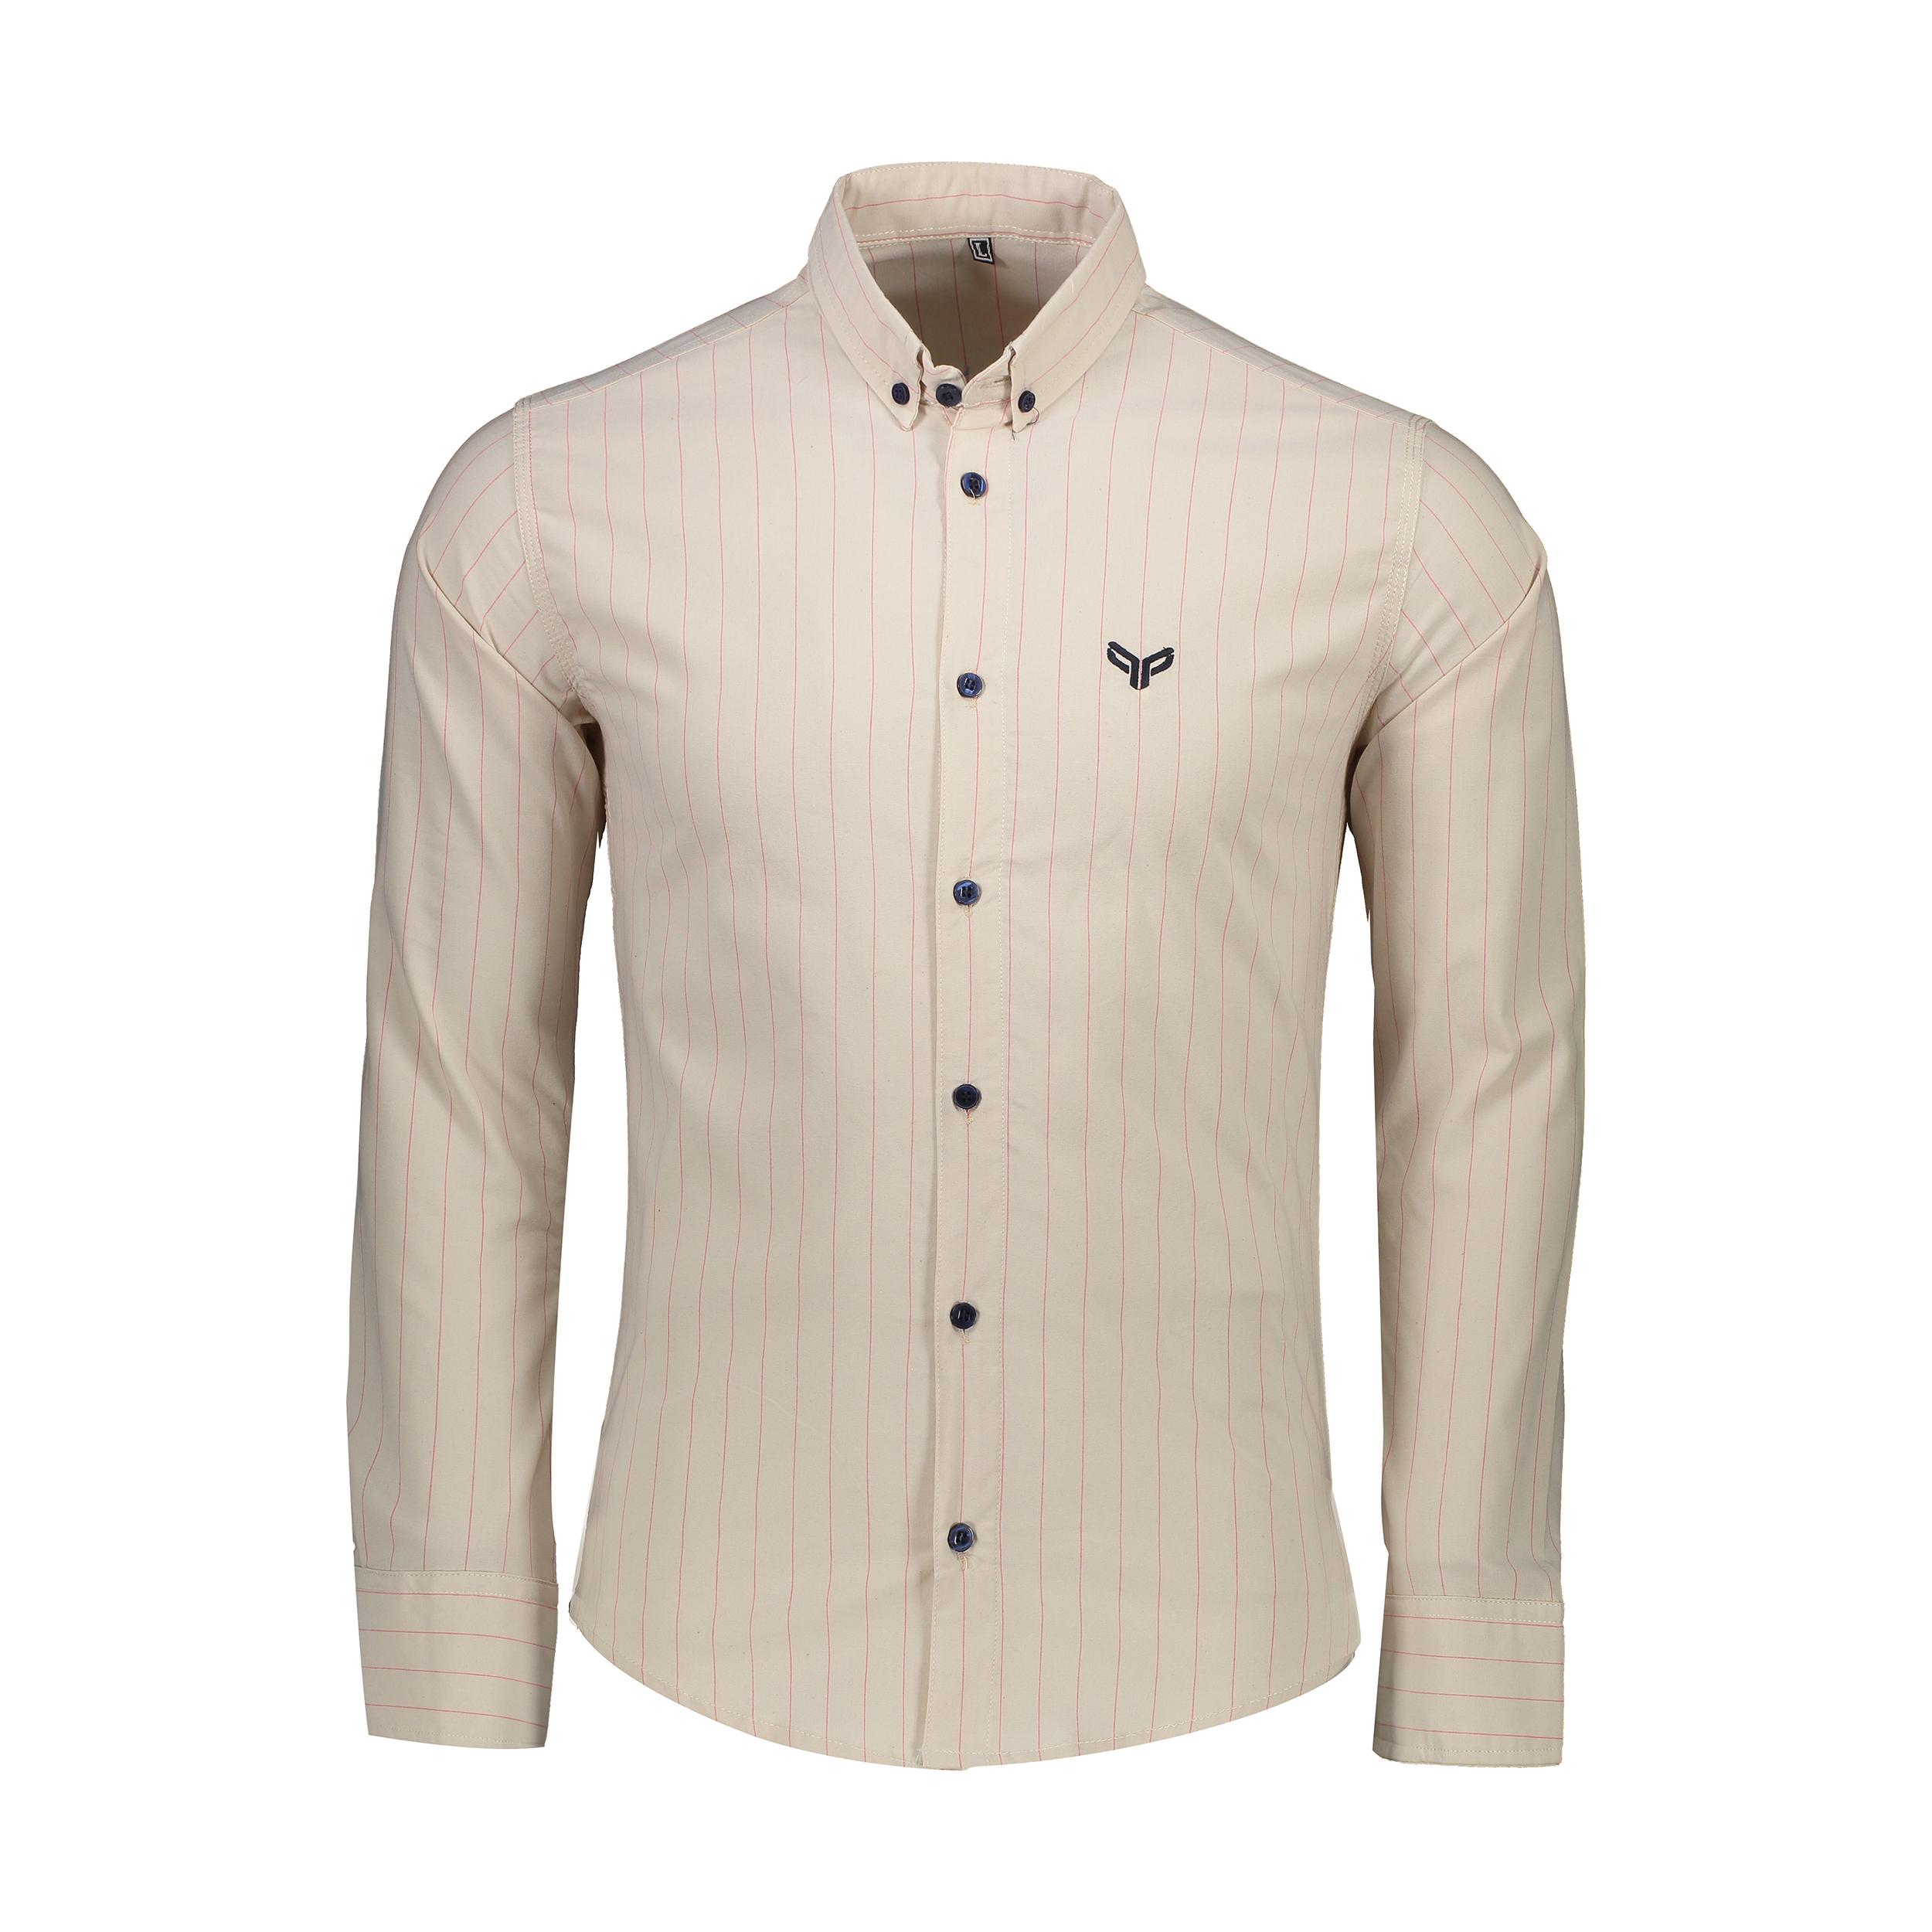 پیراهن مردانه کد M02251